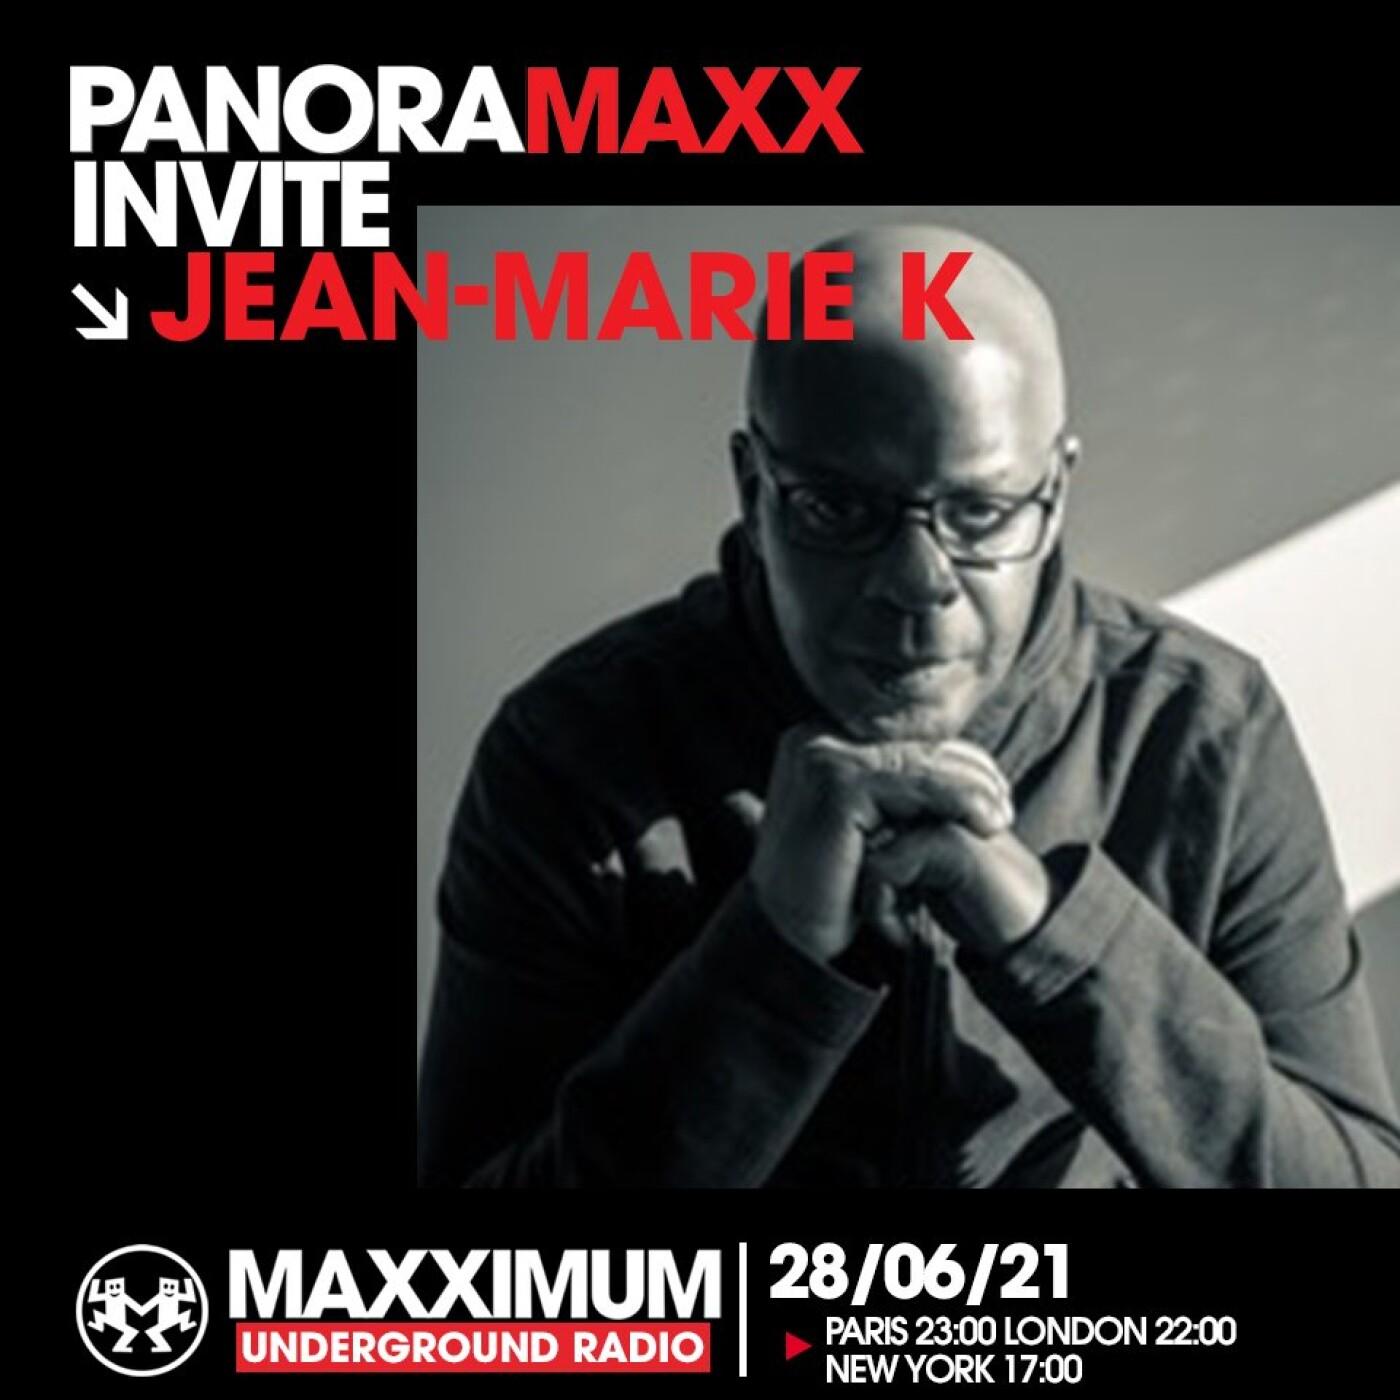 PANORAMAXX : JEAN-MARIE K